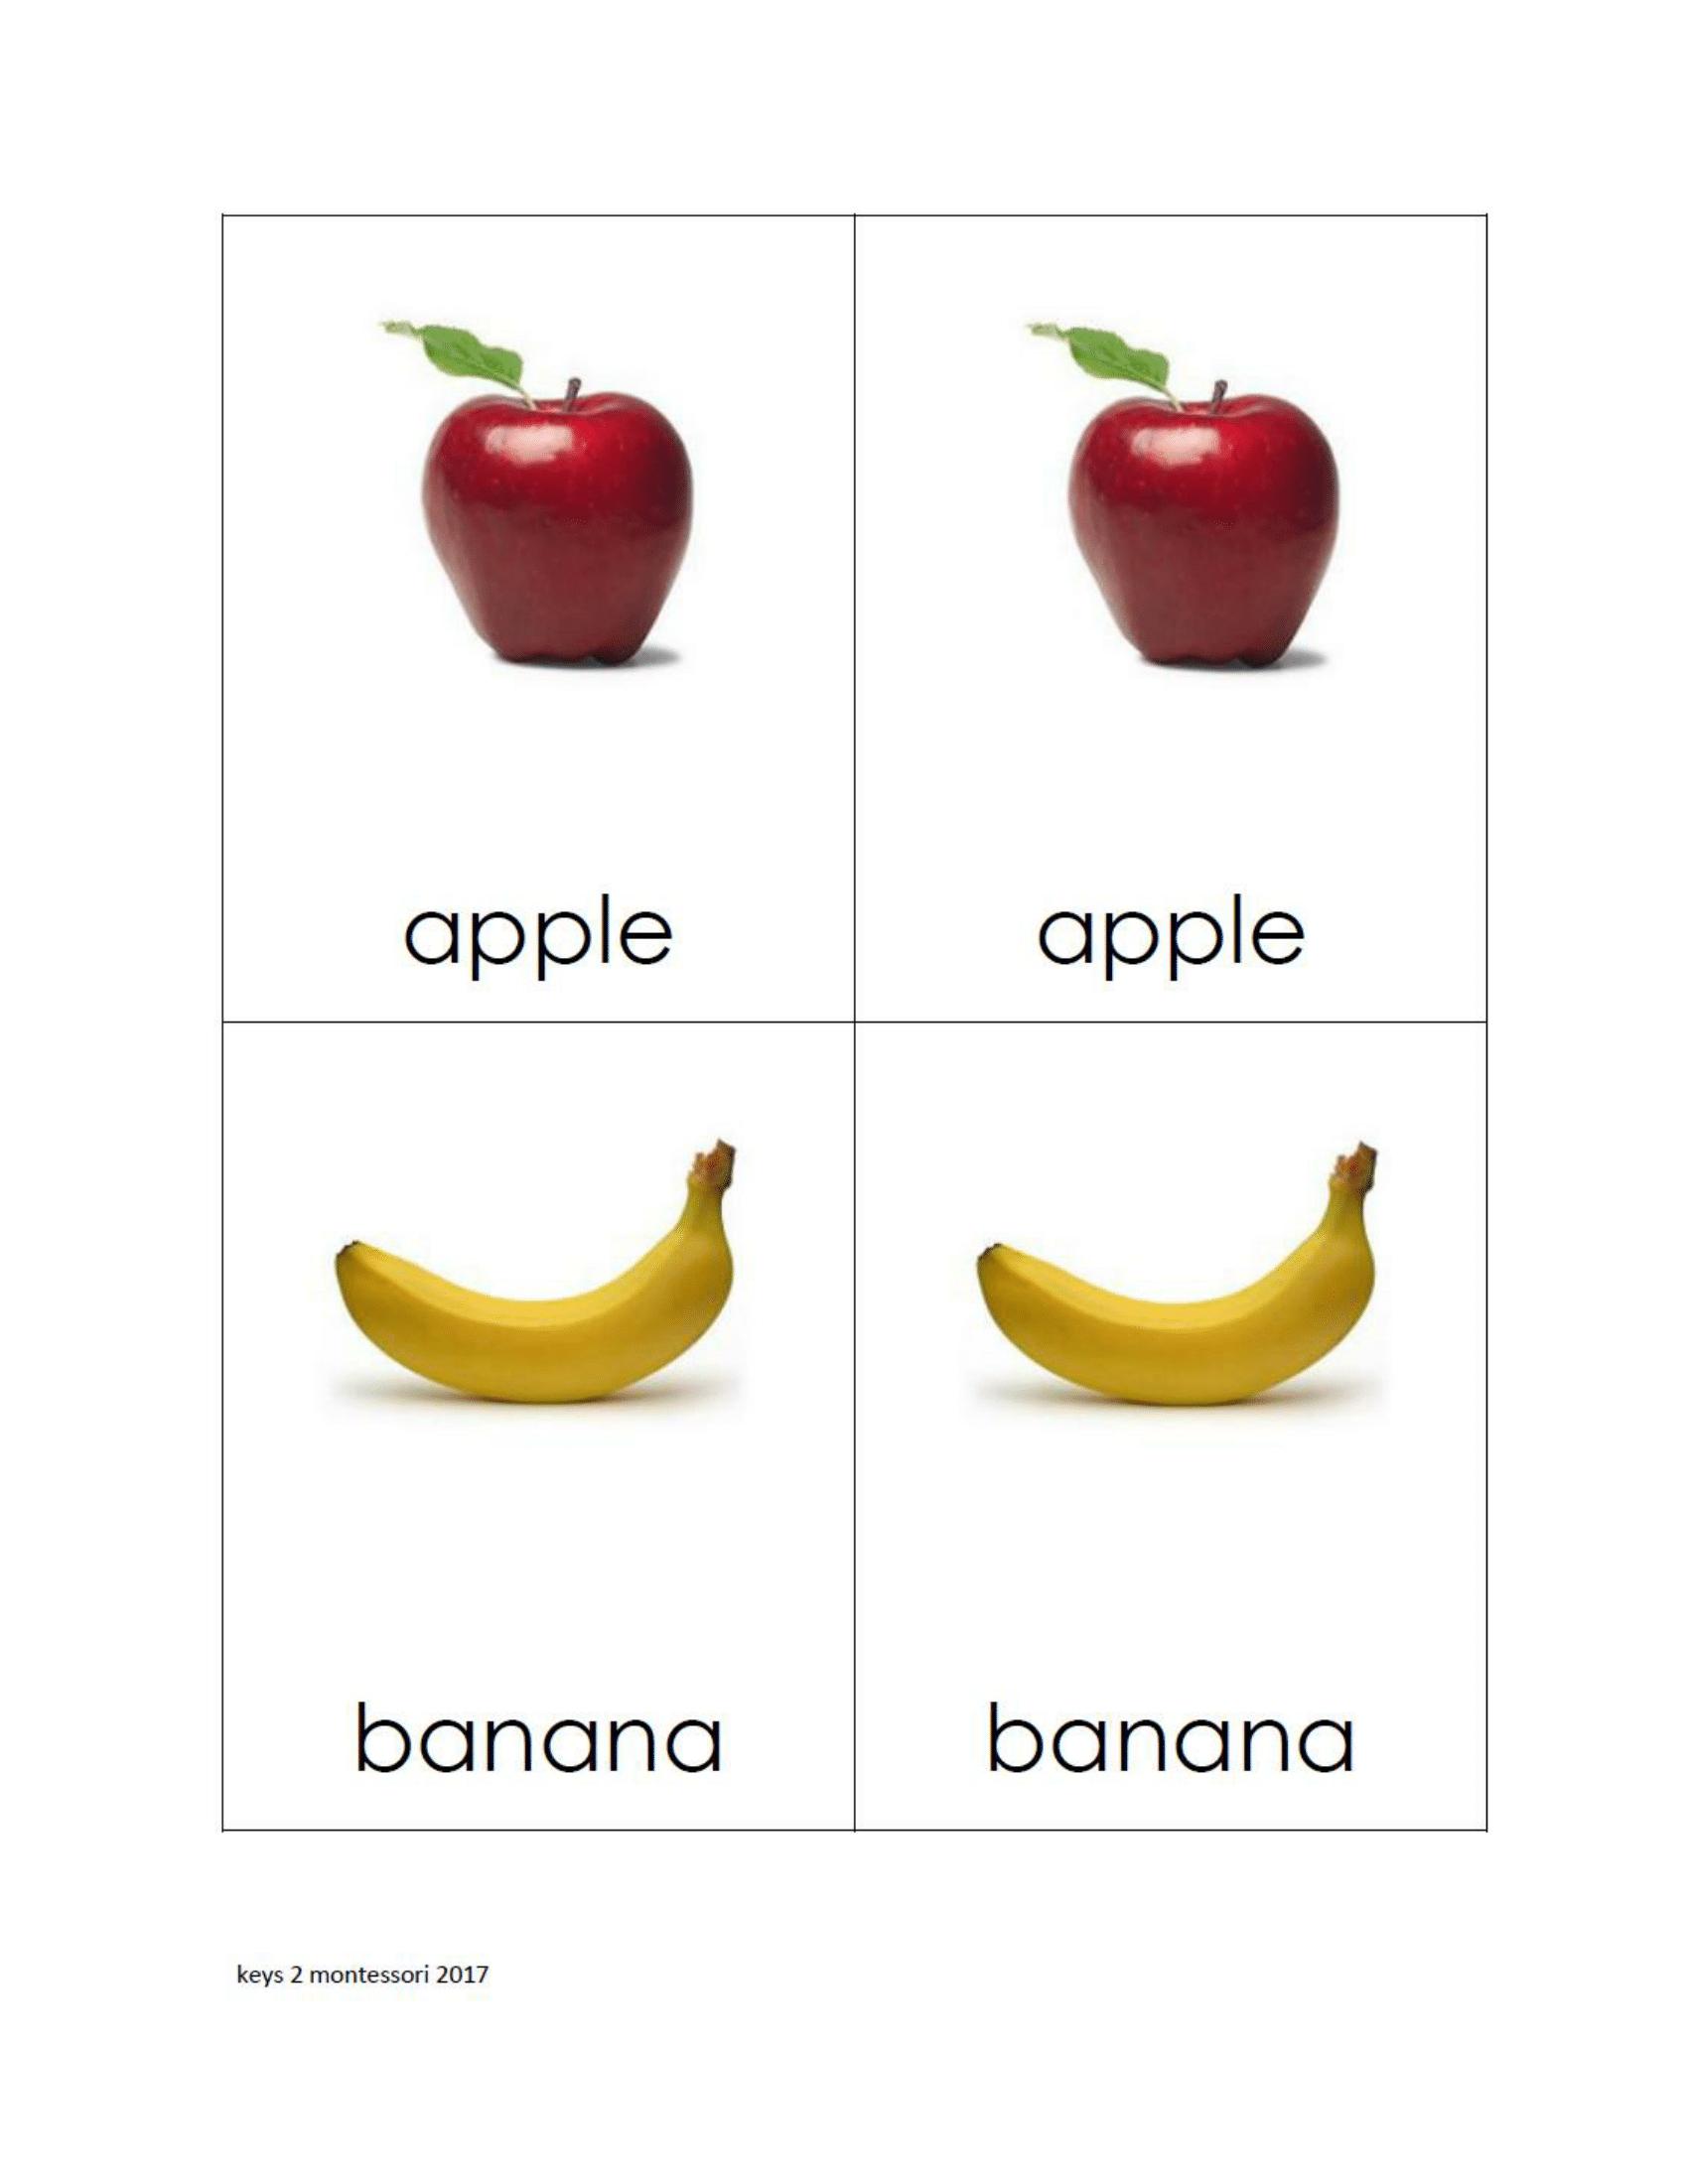 Fruit Matching Cards 2 Print